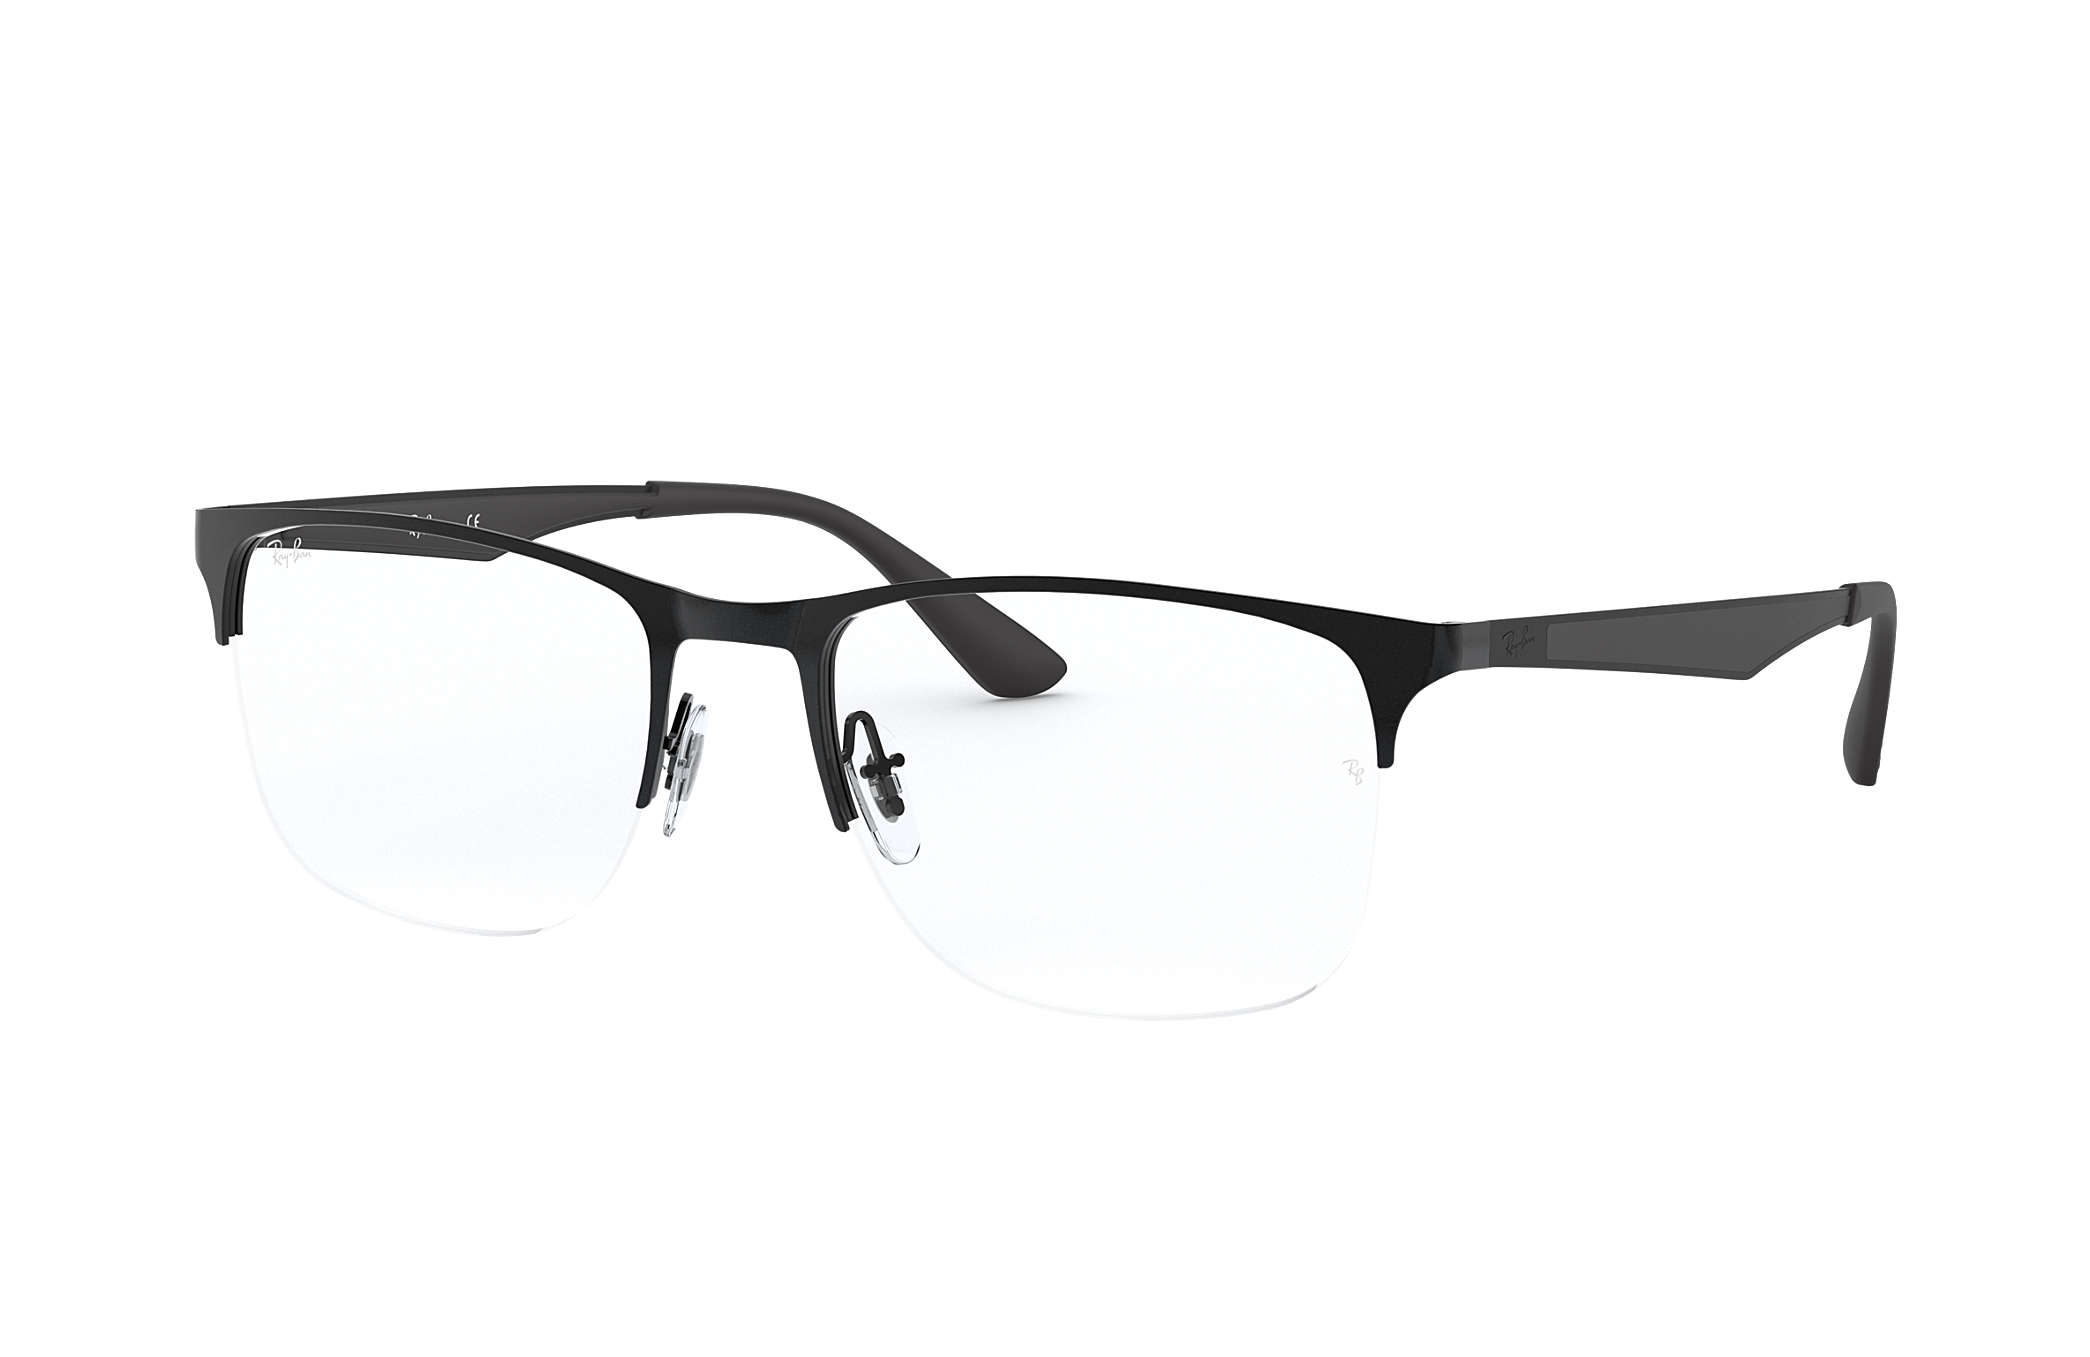 5dc67dee807 Ray-Ban prescription glasses RB6362 Black - Metal - 0RX6362250953 ...